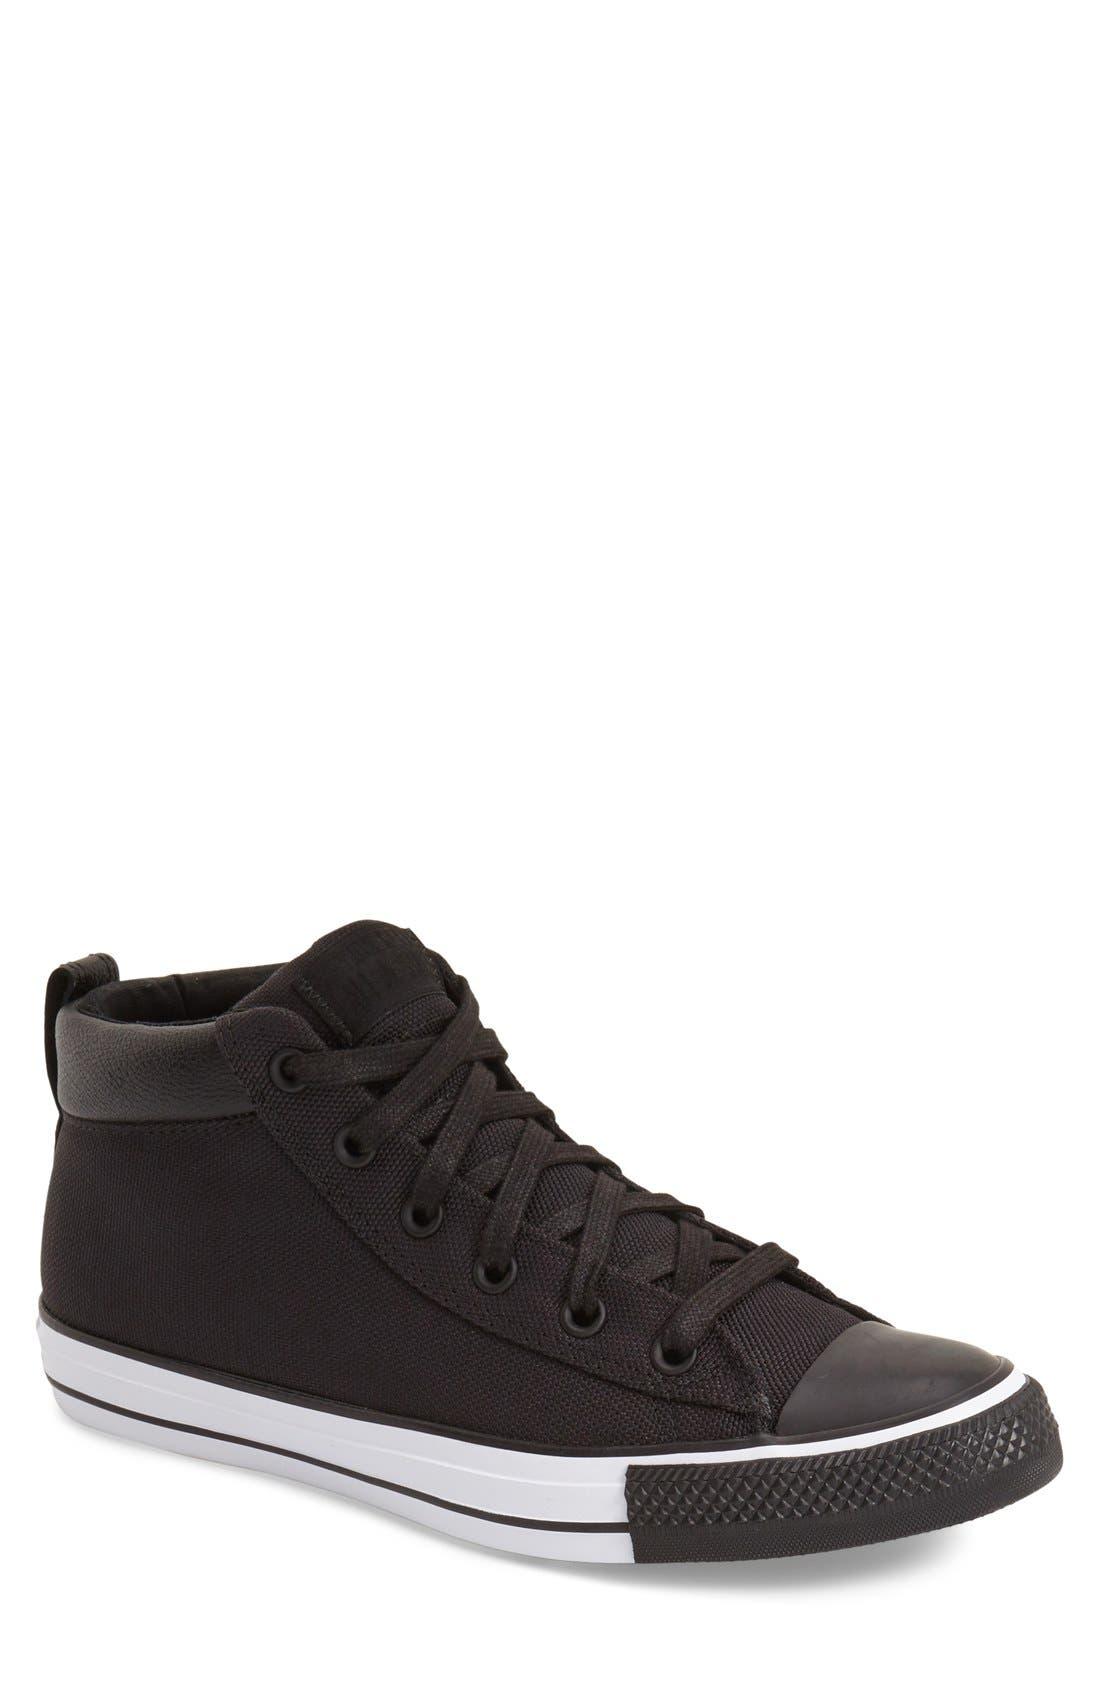 Main Image - Converse Chuck Taylor® All Star® 'Street' High Top Sneaker (Men)